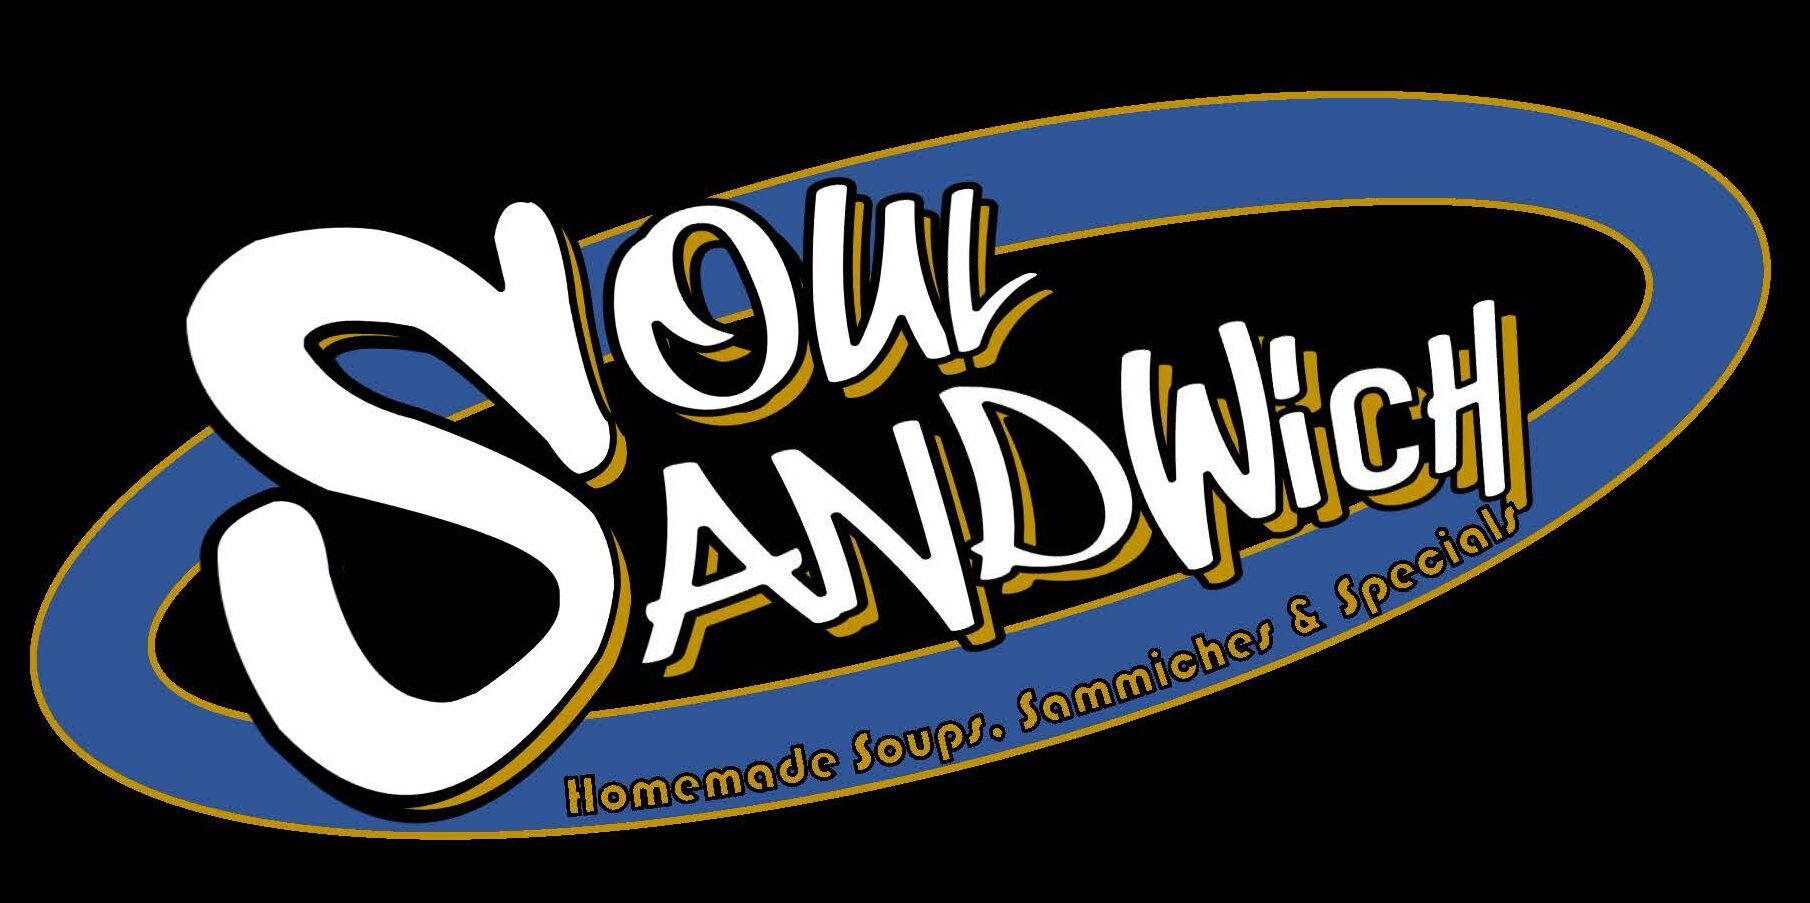 Soul Sandwich